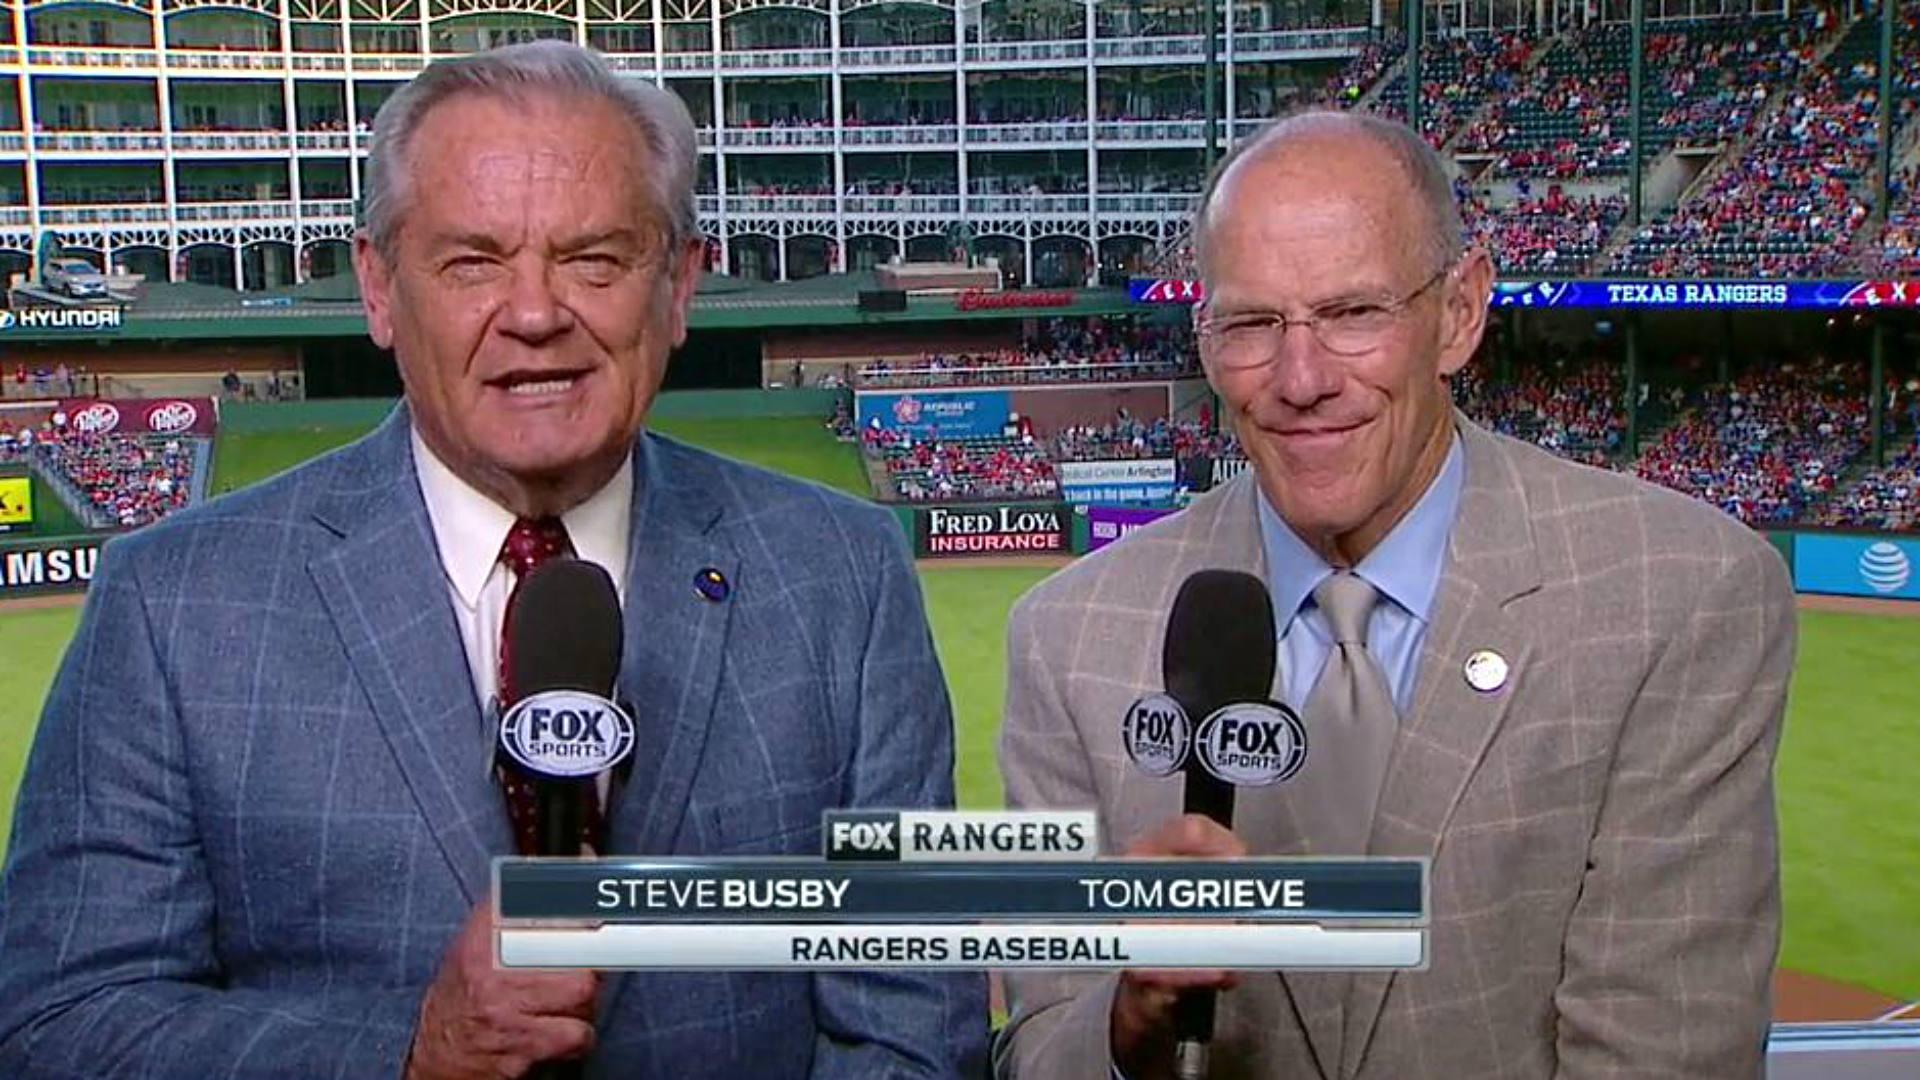 Rangers-booth-ftr-foxjpg_vxfnq9969d8l1kxr9ikvirslq